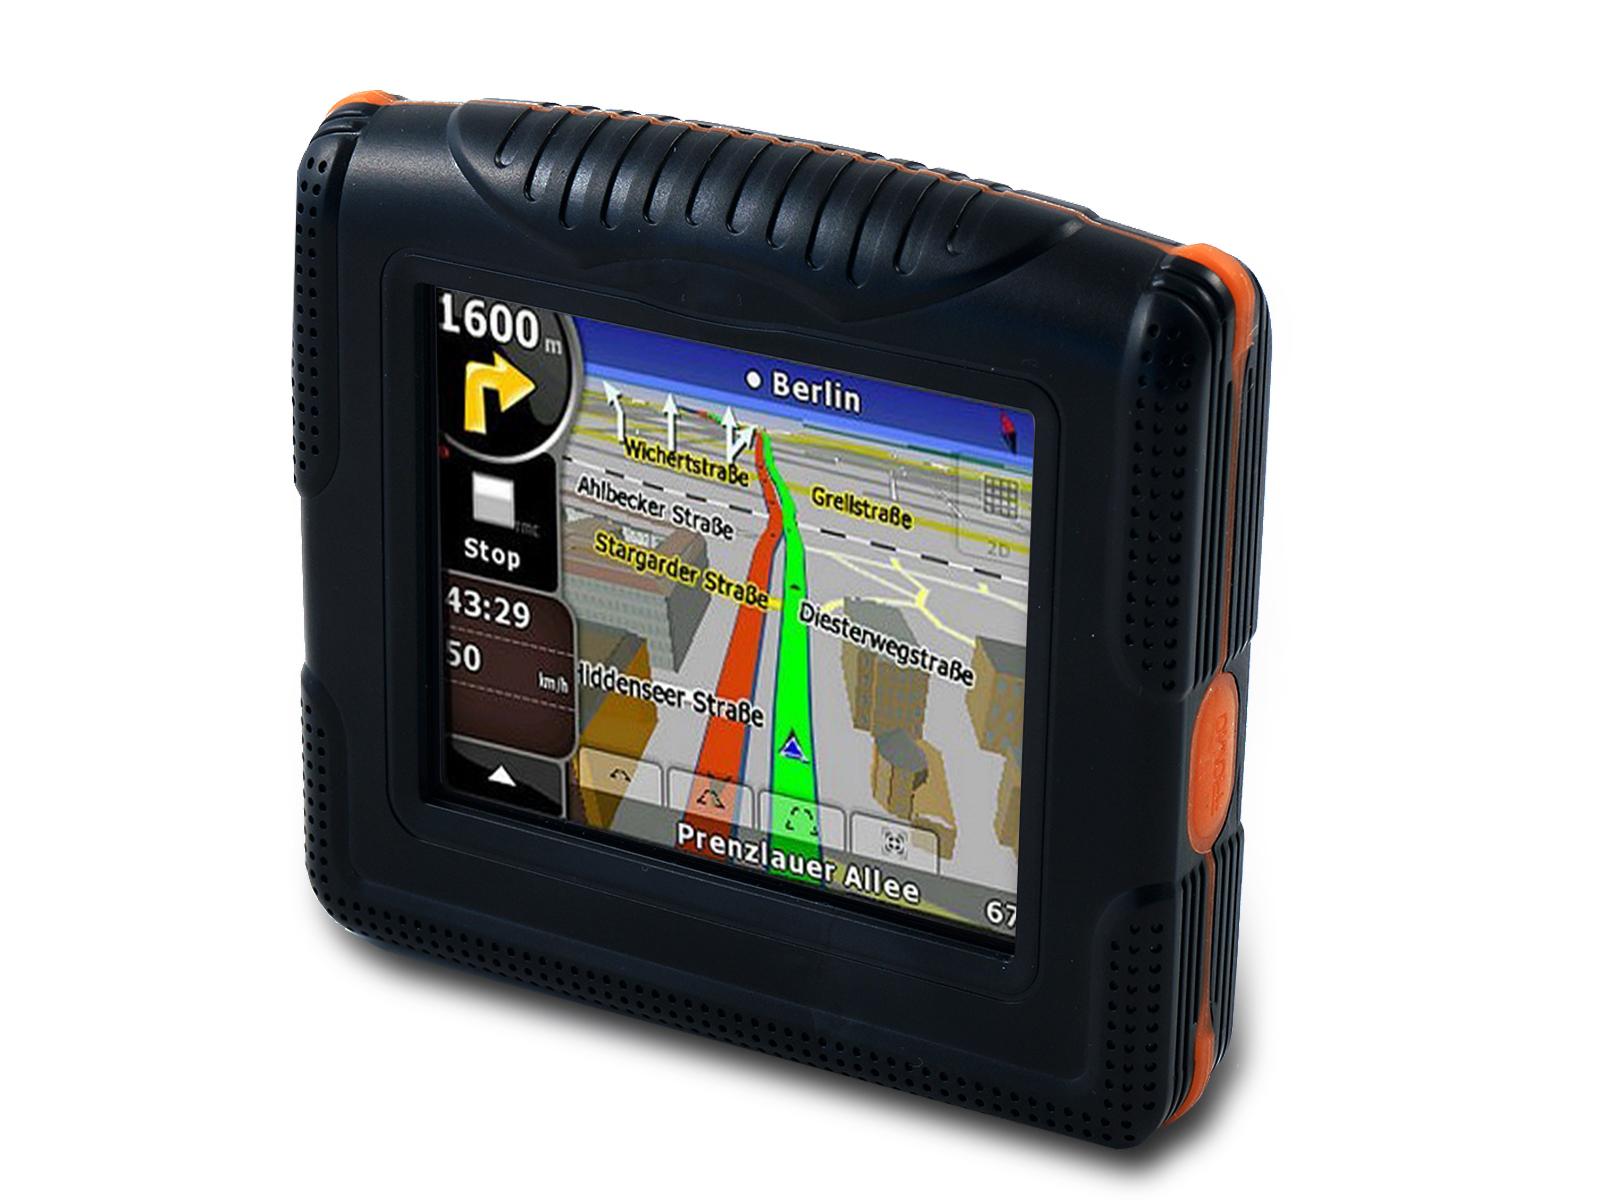 Motorcycle Navigation Systems : Vianav motorcycle sat nav gps navigation system for